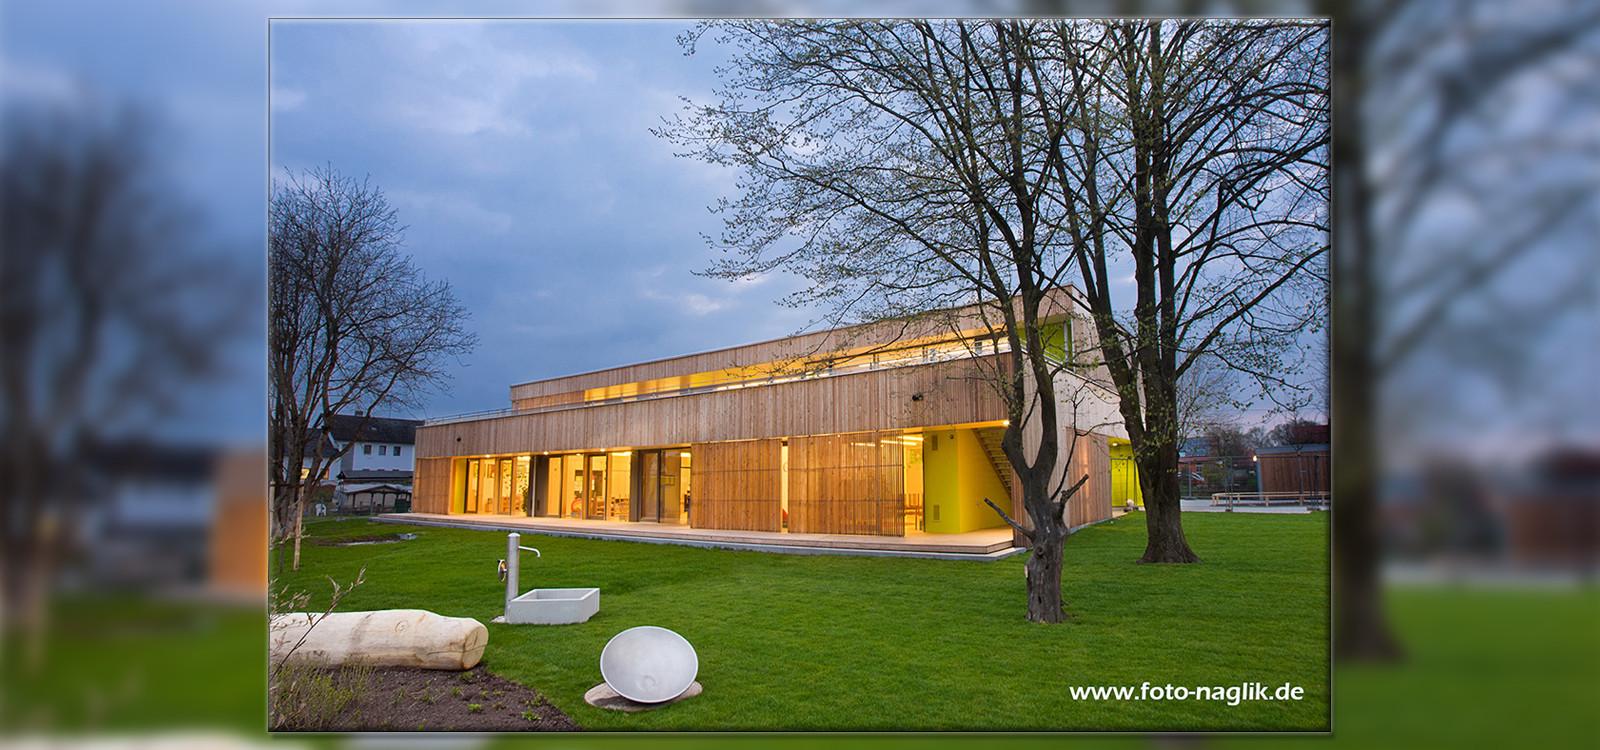 Naglik-Foto-Erding-Architektur-13 Kopie